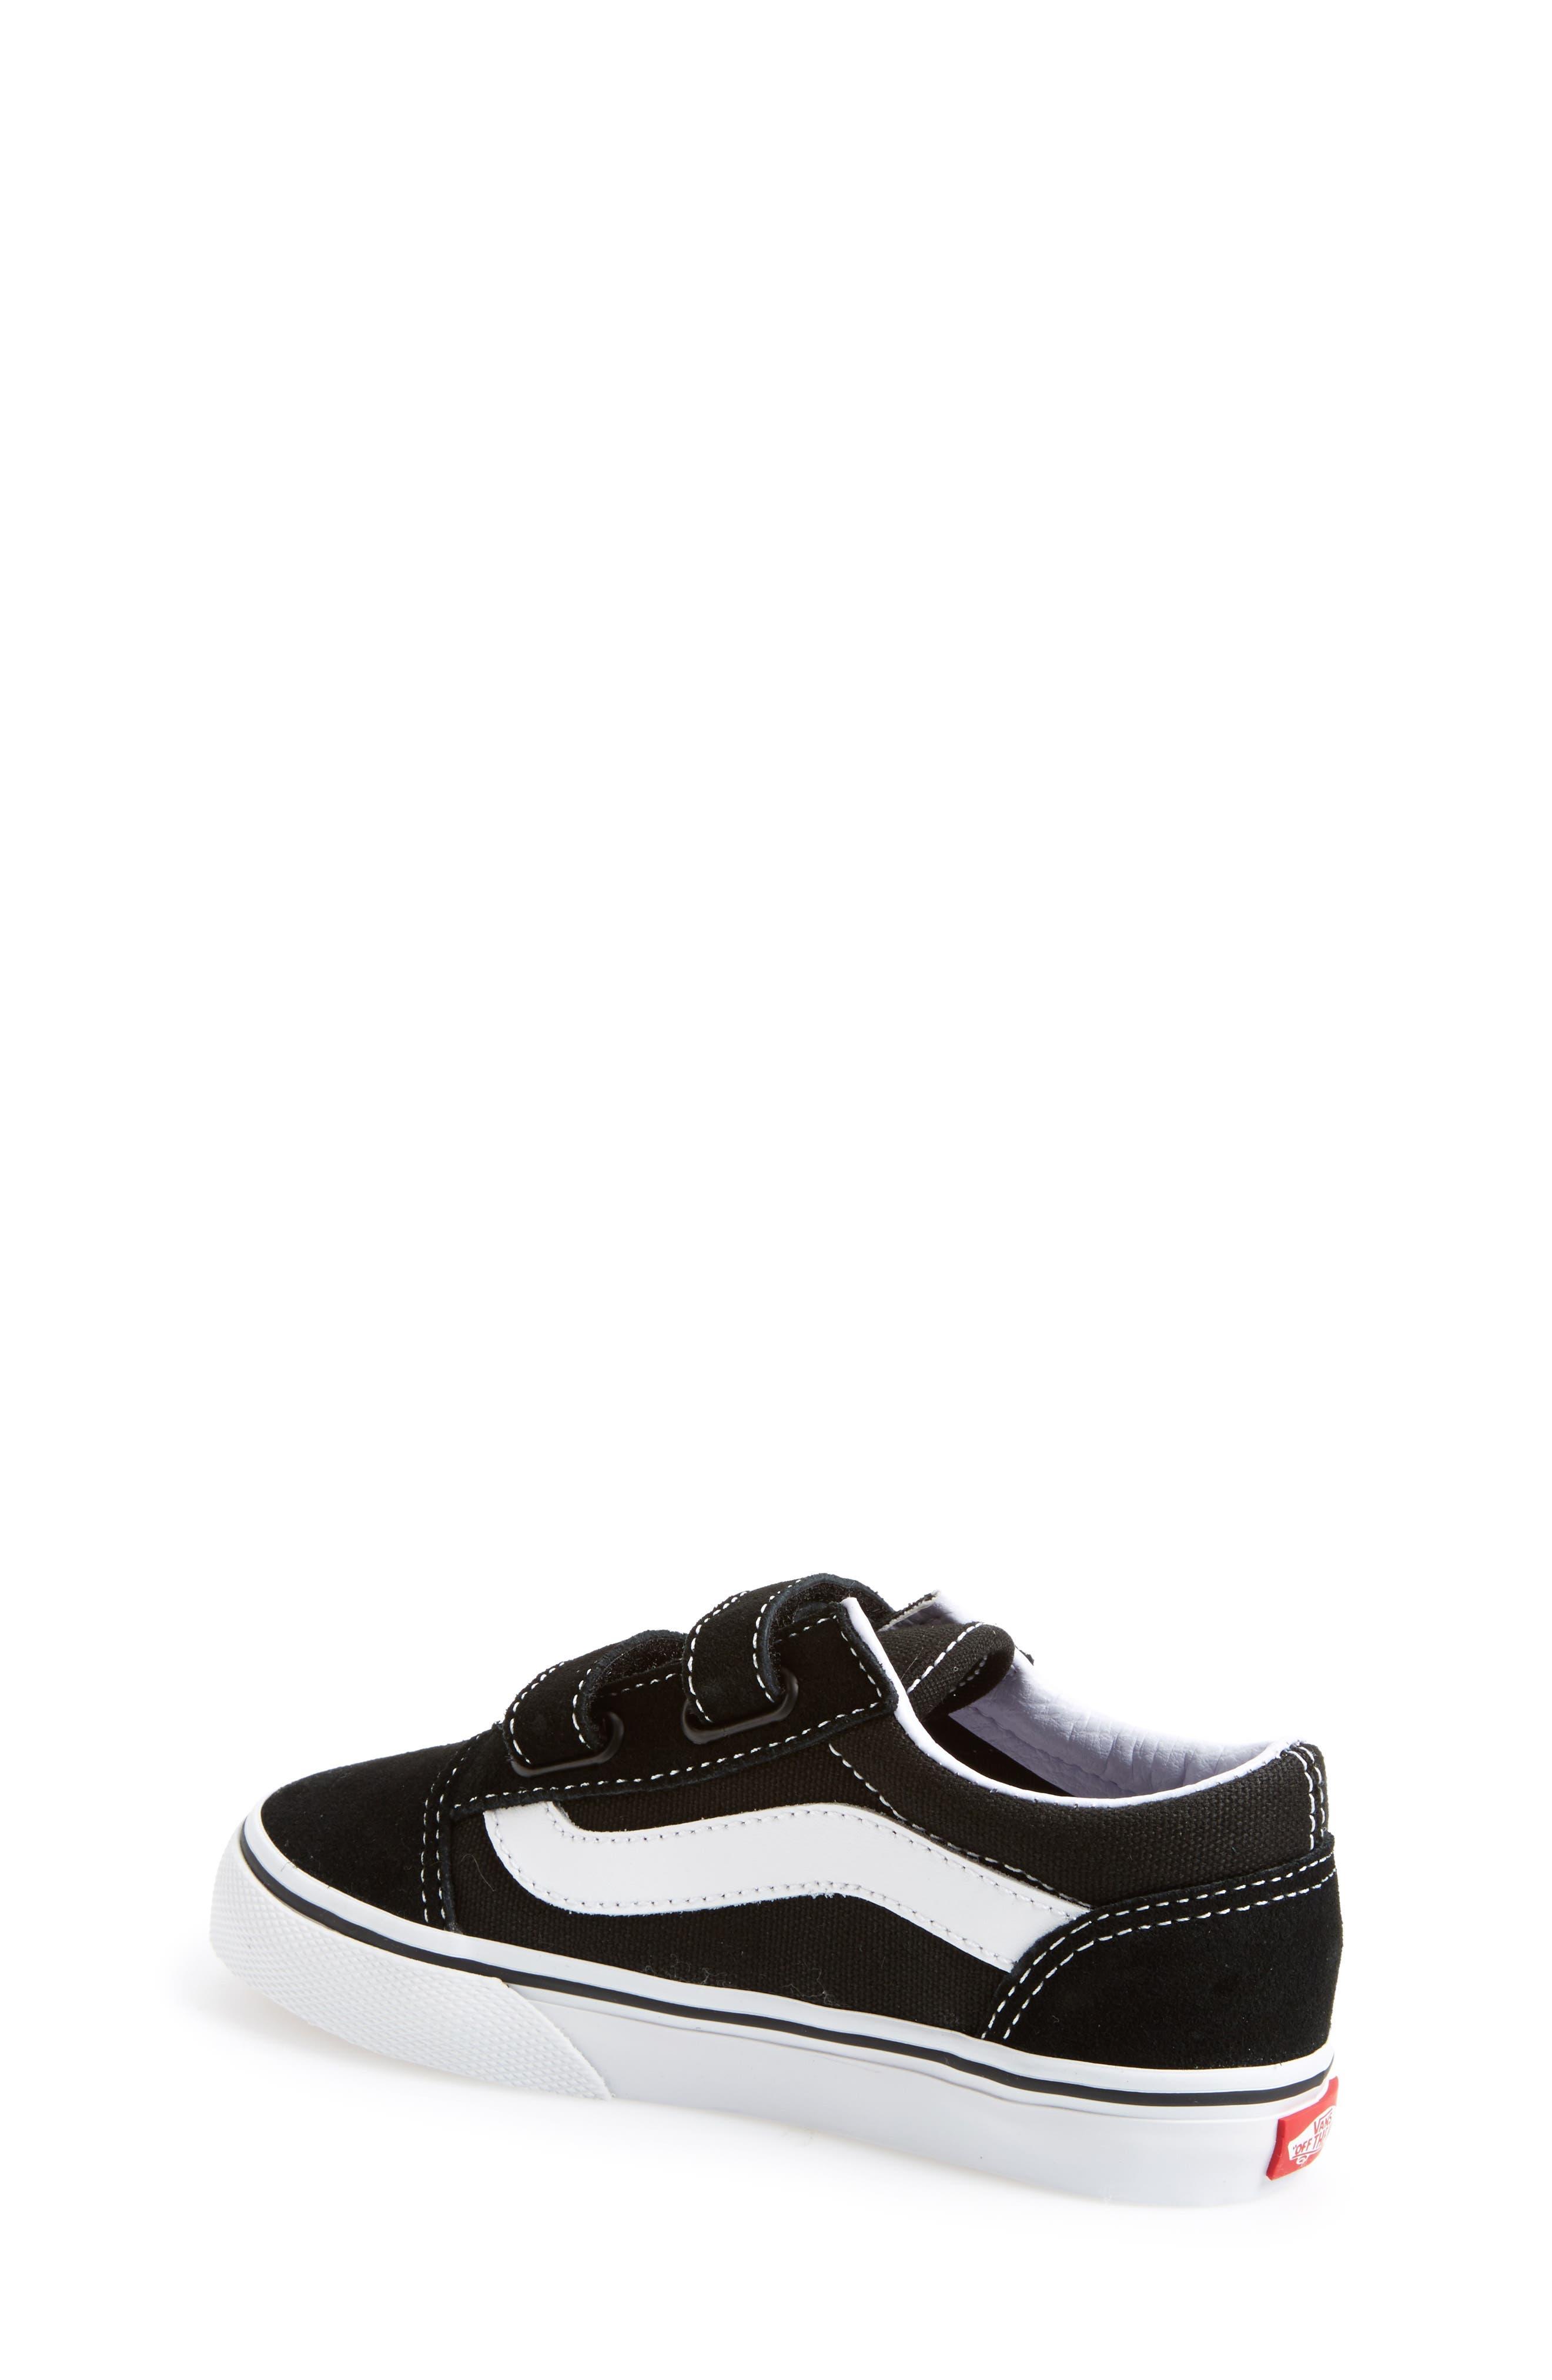 Alternate Image 2  - Vans 'Old Skool V' Sneaker (Toddler, Little Kid & Big Kid)